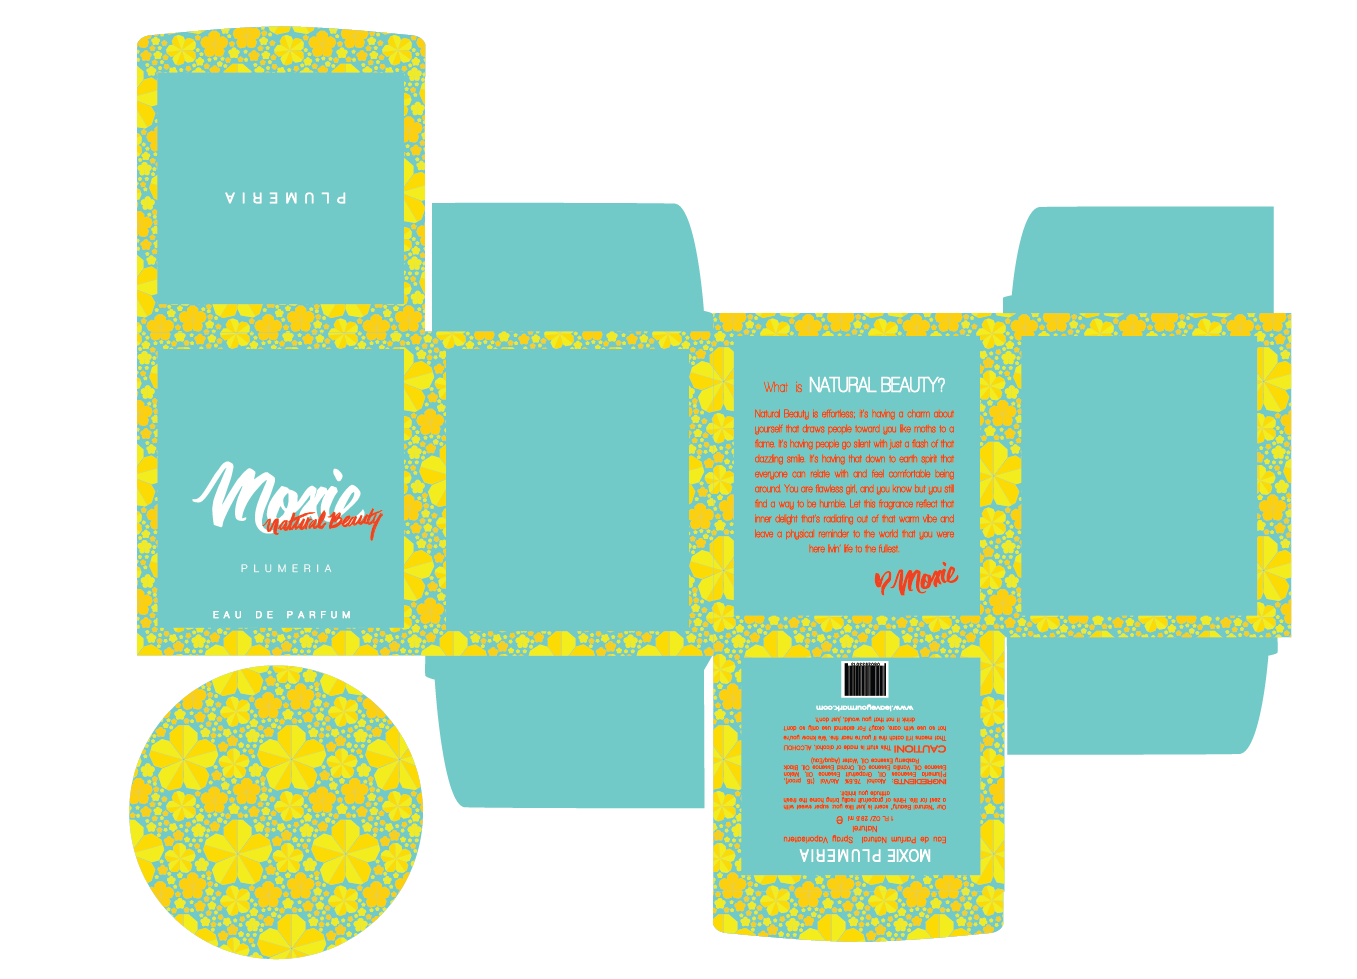 Moxie2018 Update-plumeria.png